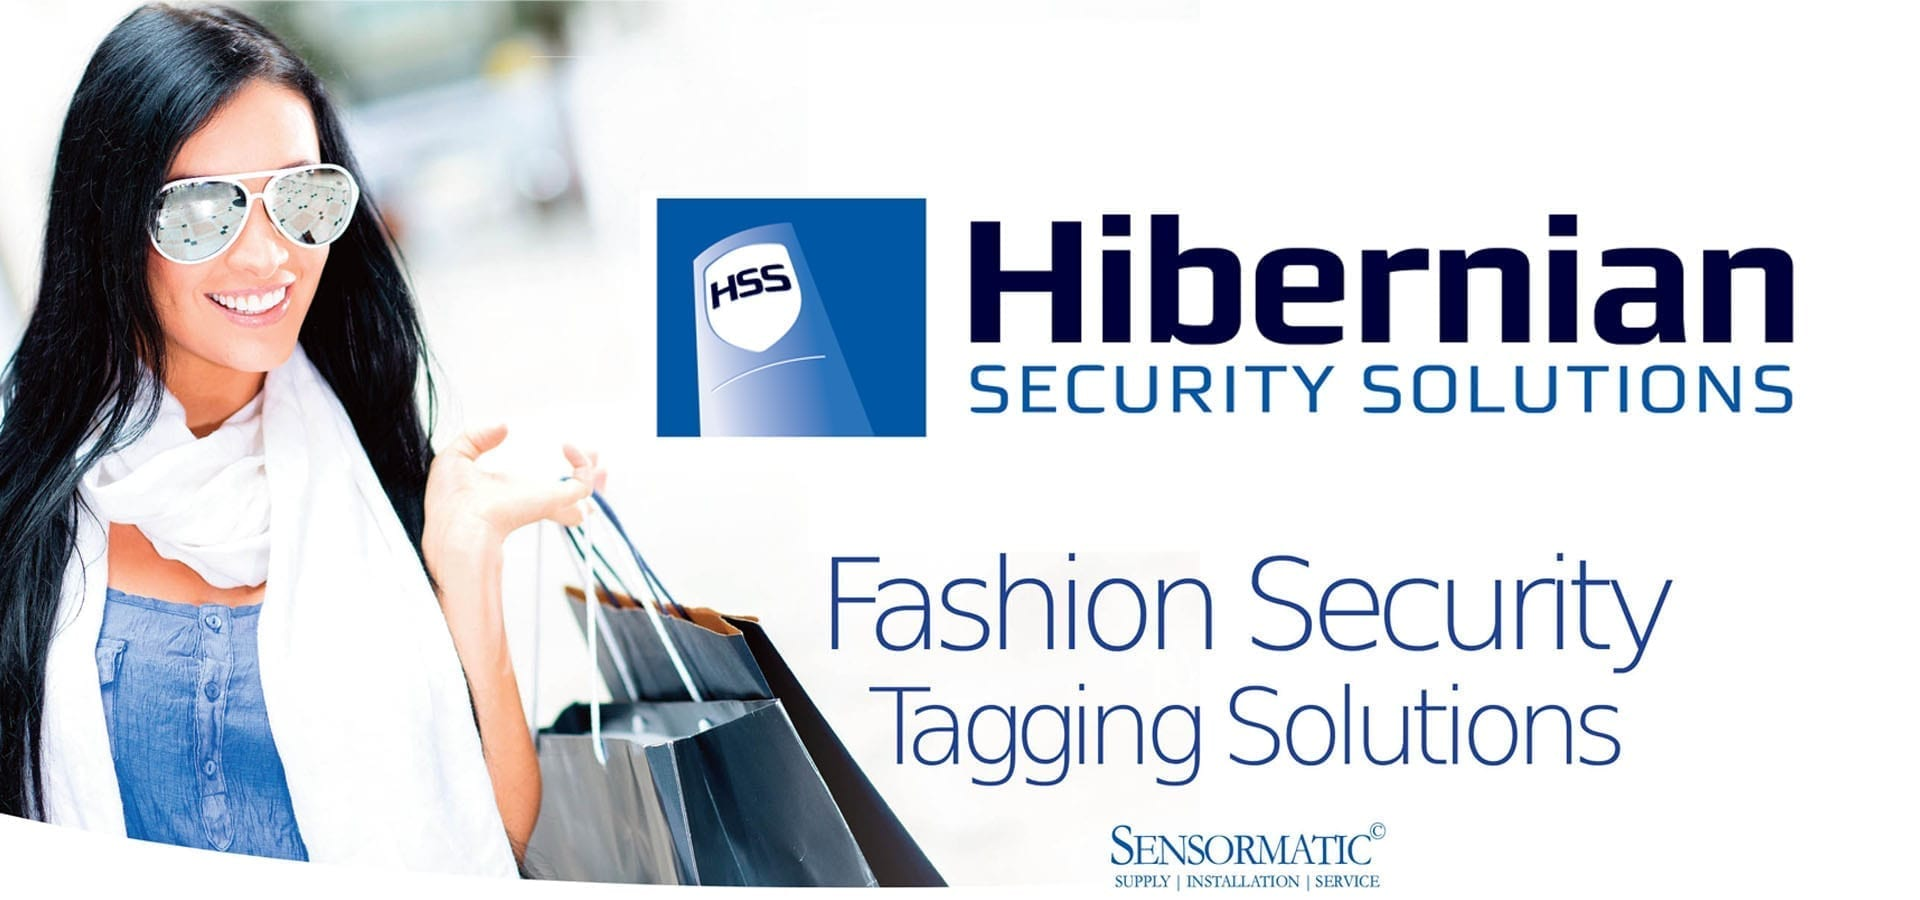 Essential Pedestals – Hibernian Security Solutions